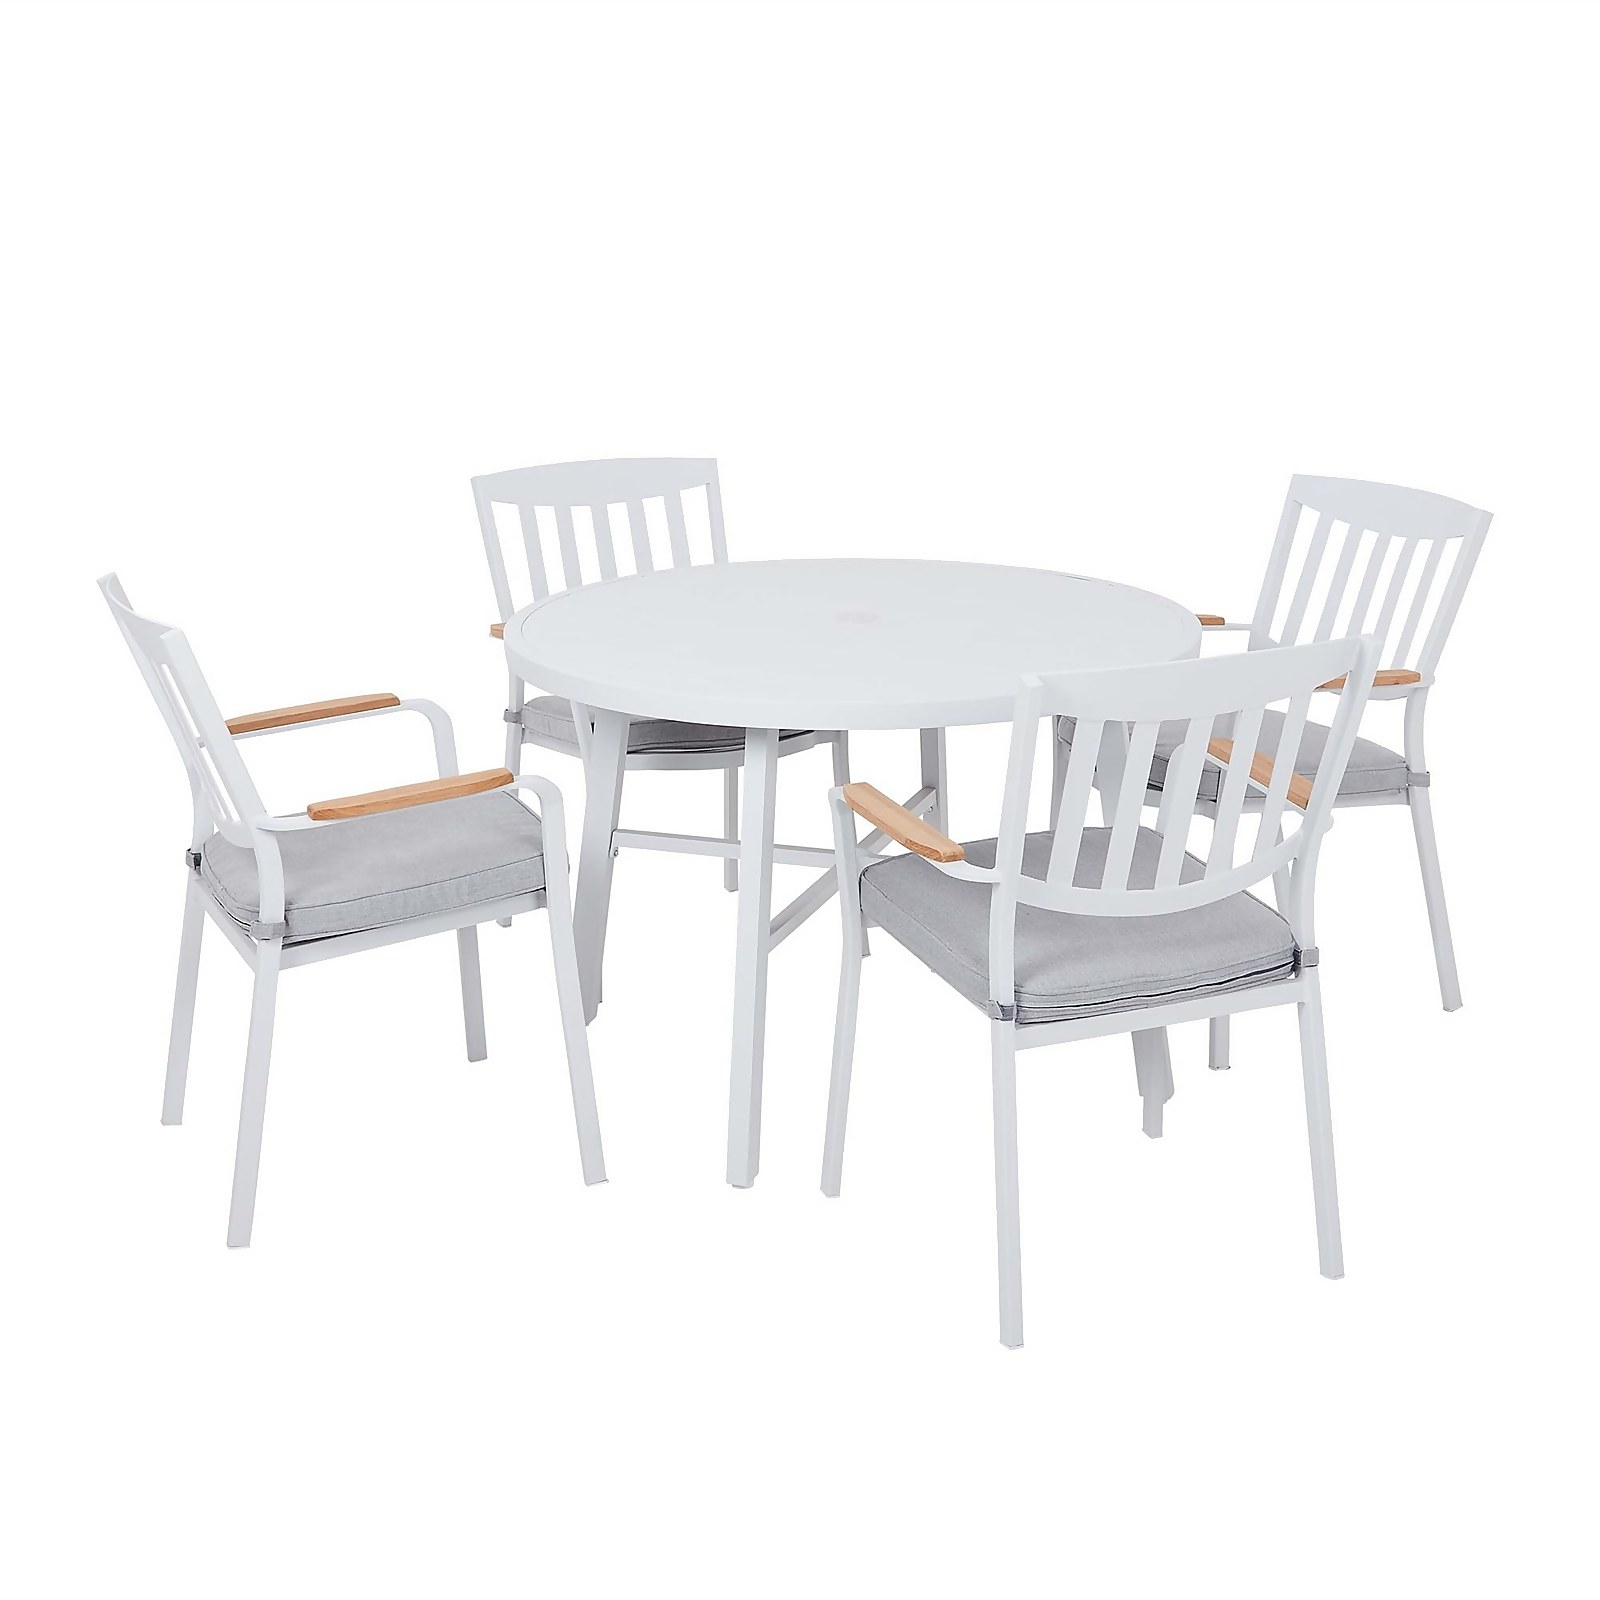 Spirit 4 Seater Garden Dining Set